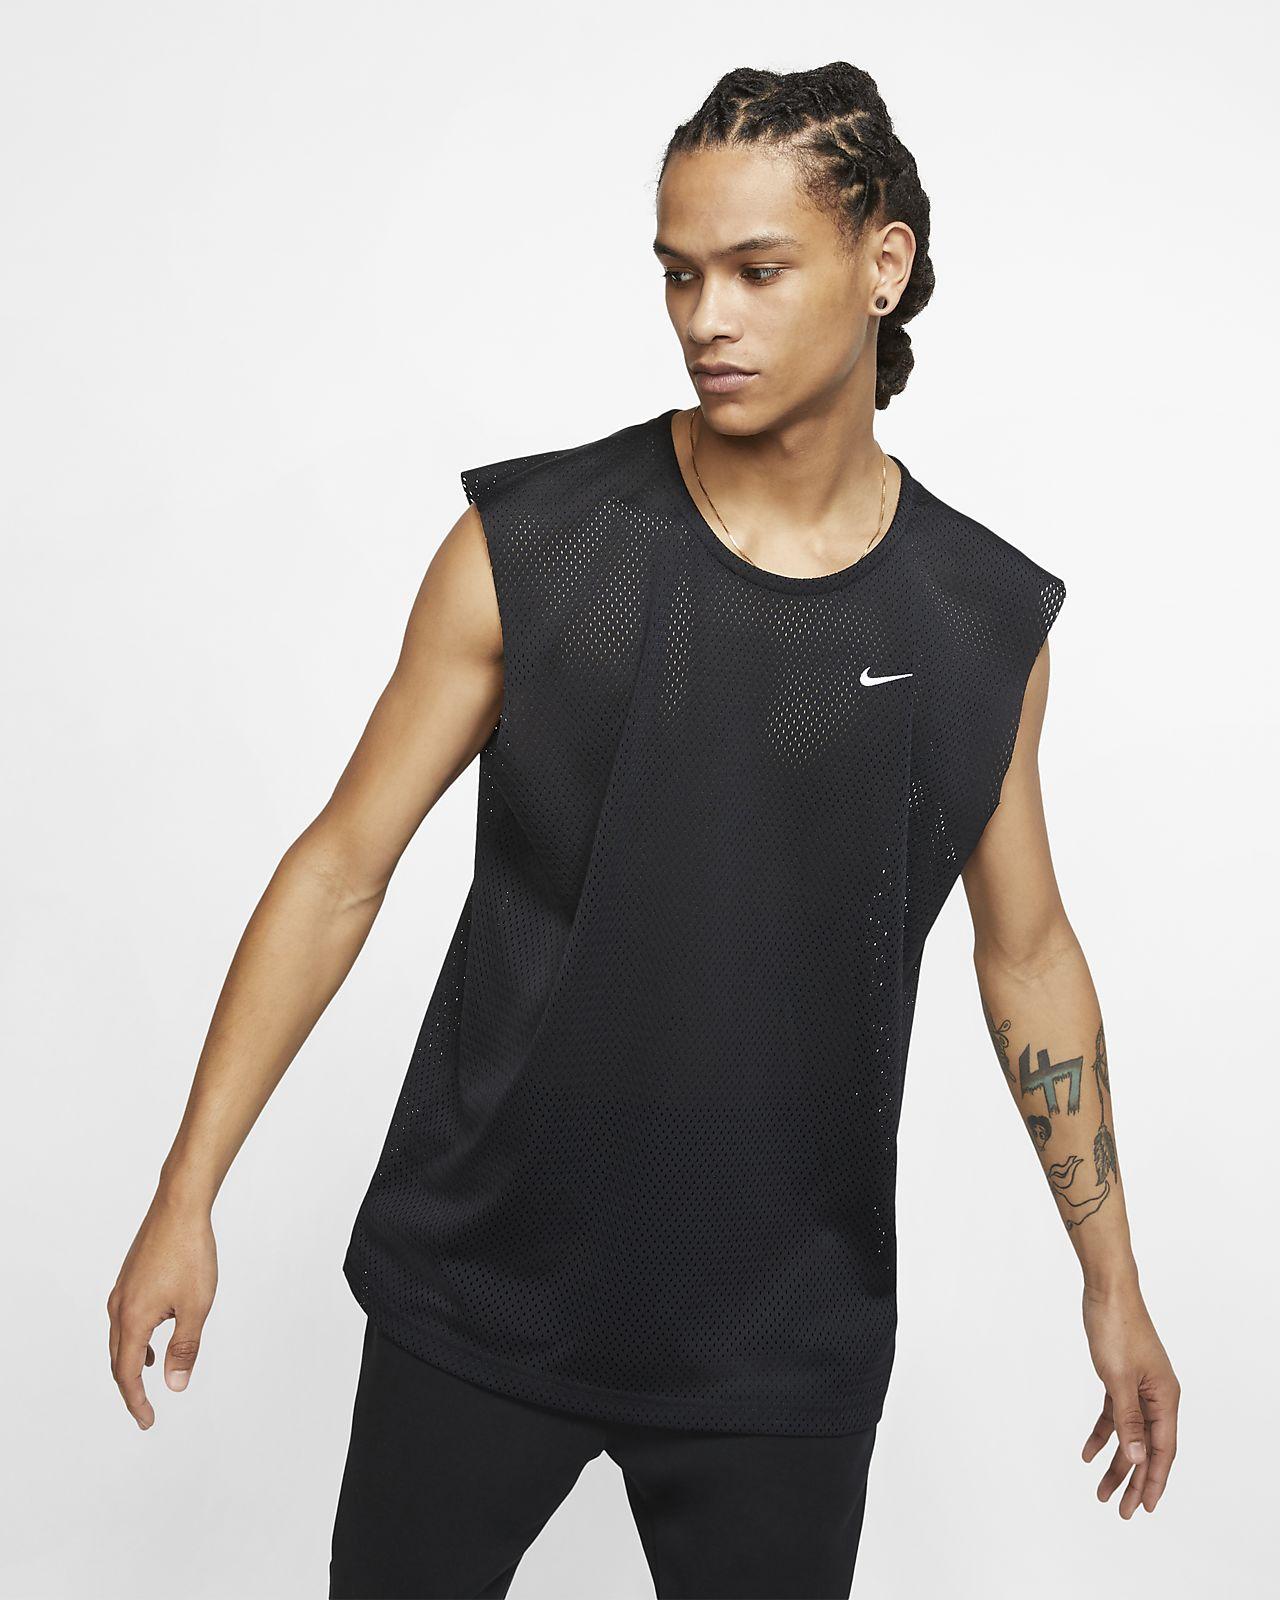 Canotta NikeLab Collection - Uomo